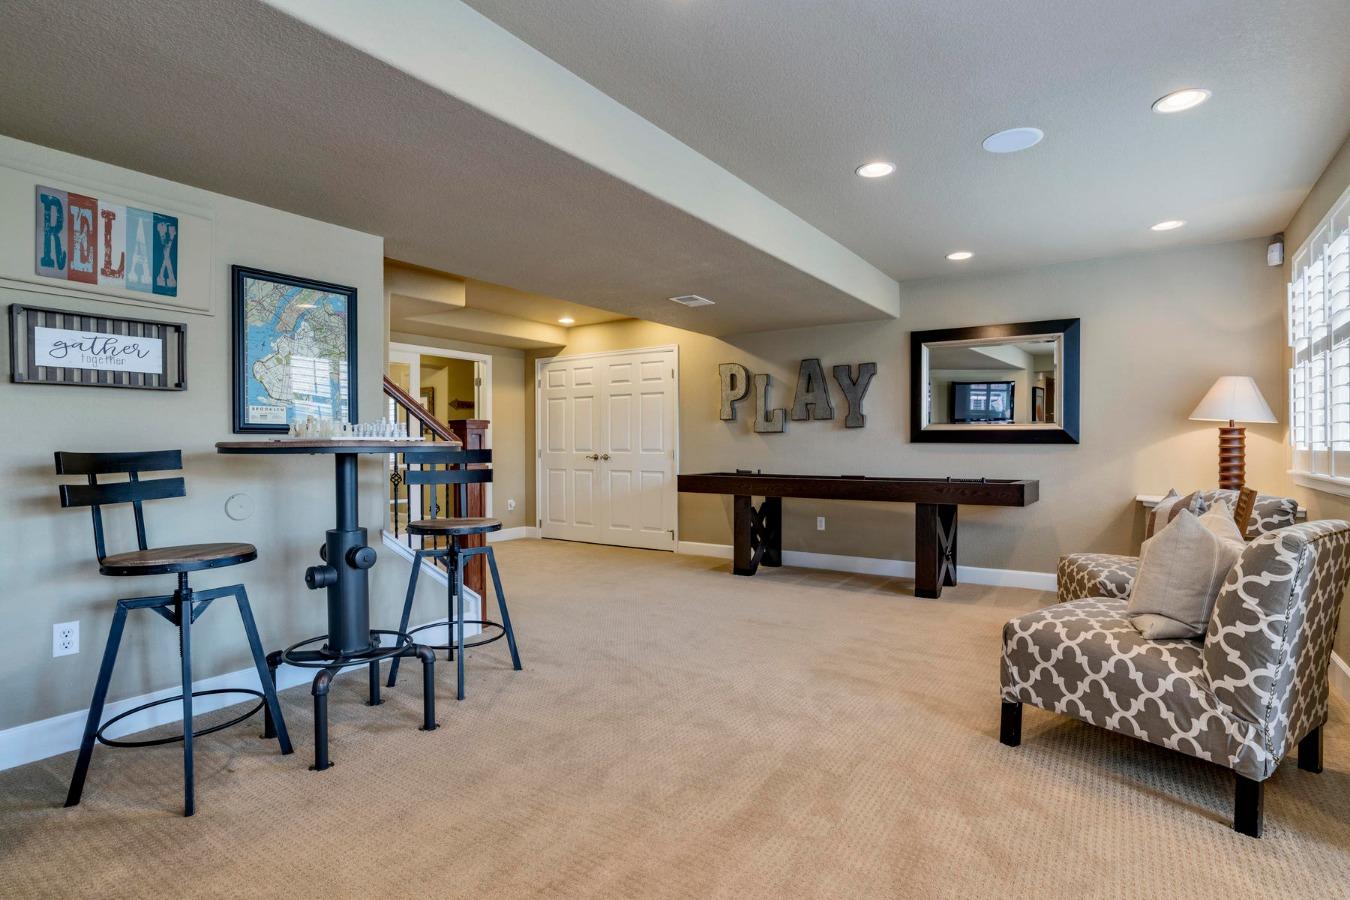 Three Distinct Flexilbe Areas in Rec Room Layout